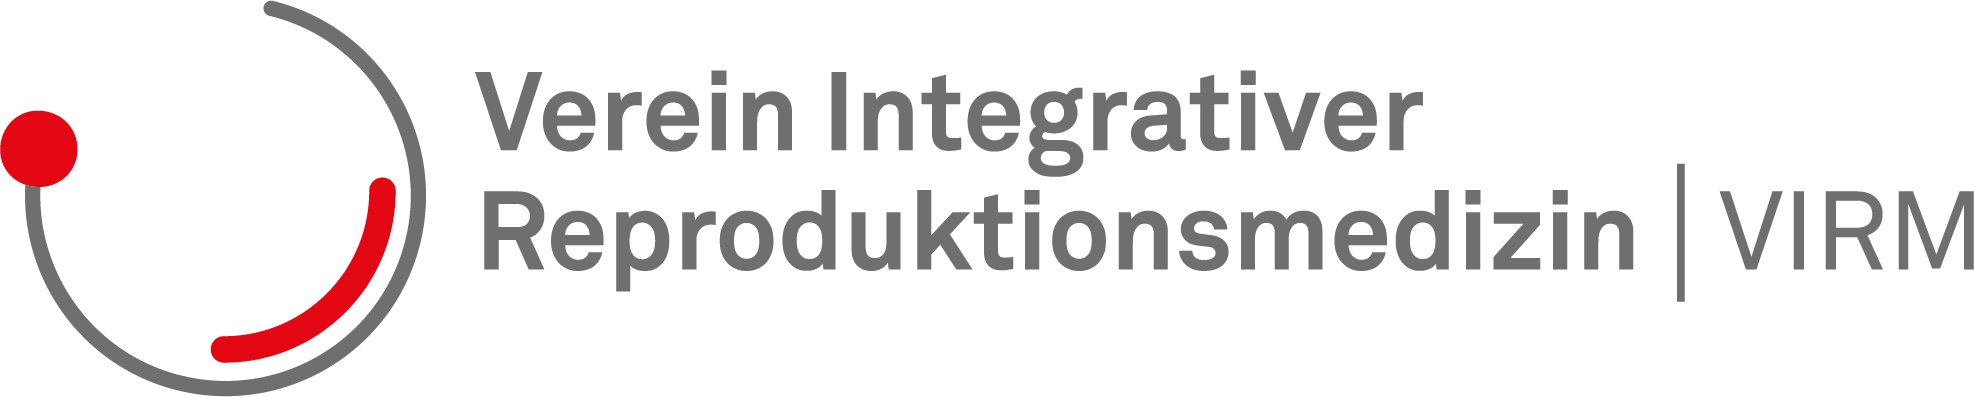 Verein Integrativer Reproduktionsmedizin | VIRM